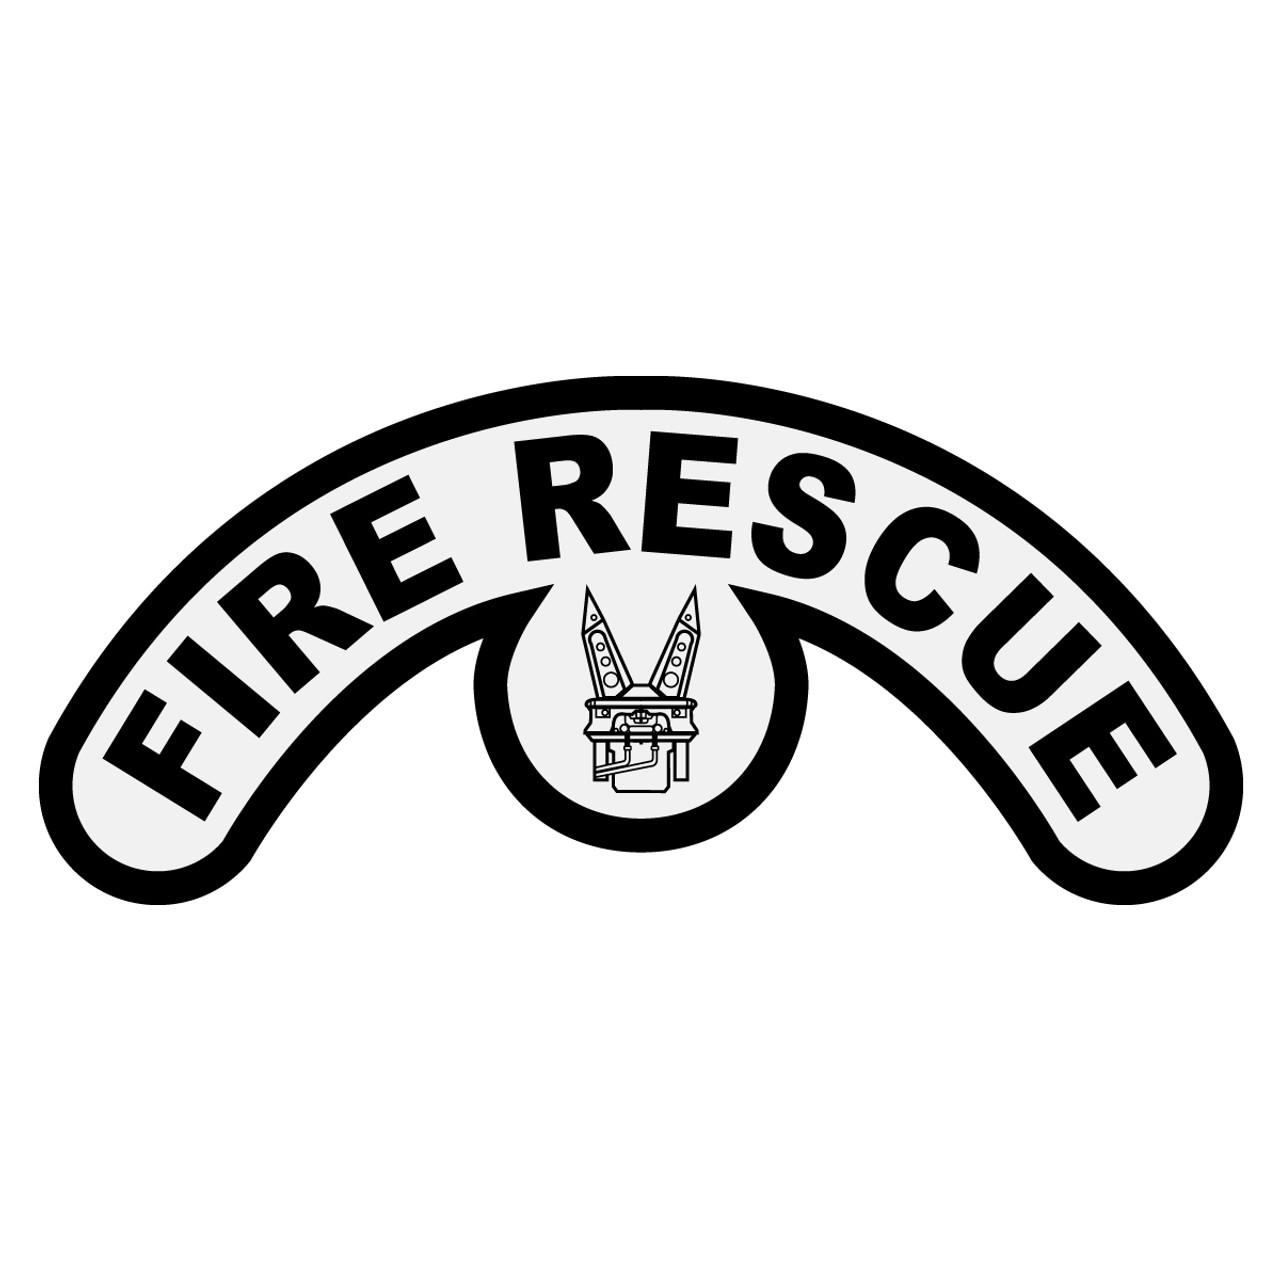 Fire Rescue White on Black Helmet Crescent Reflective Decal Sticker